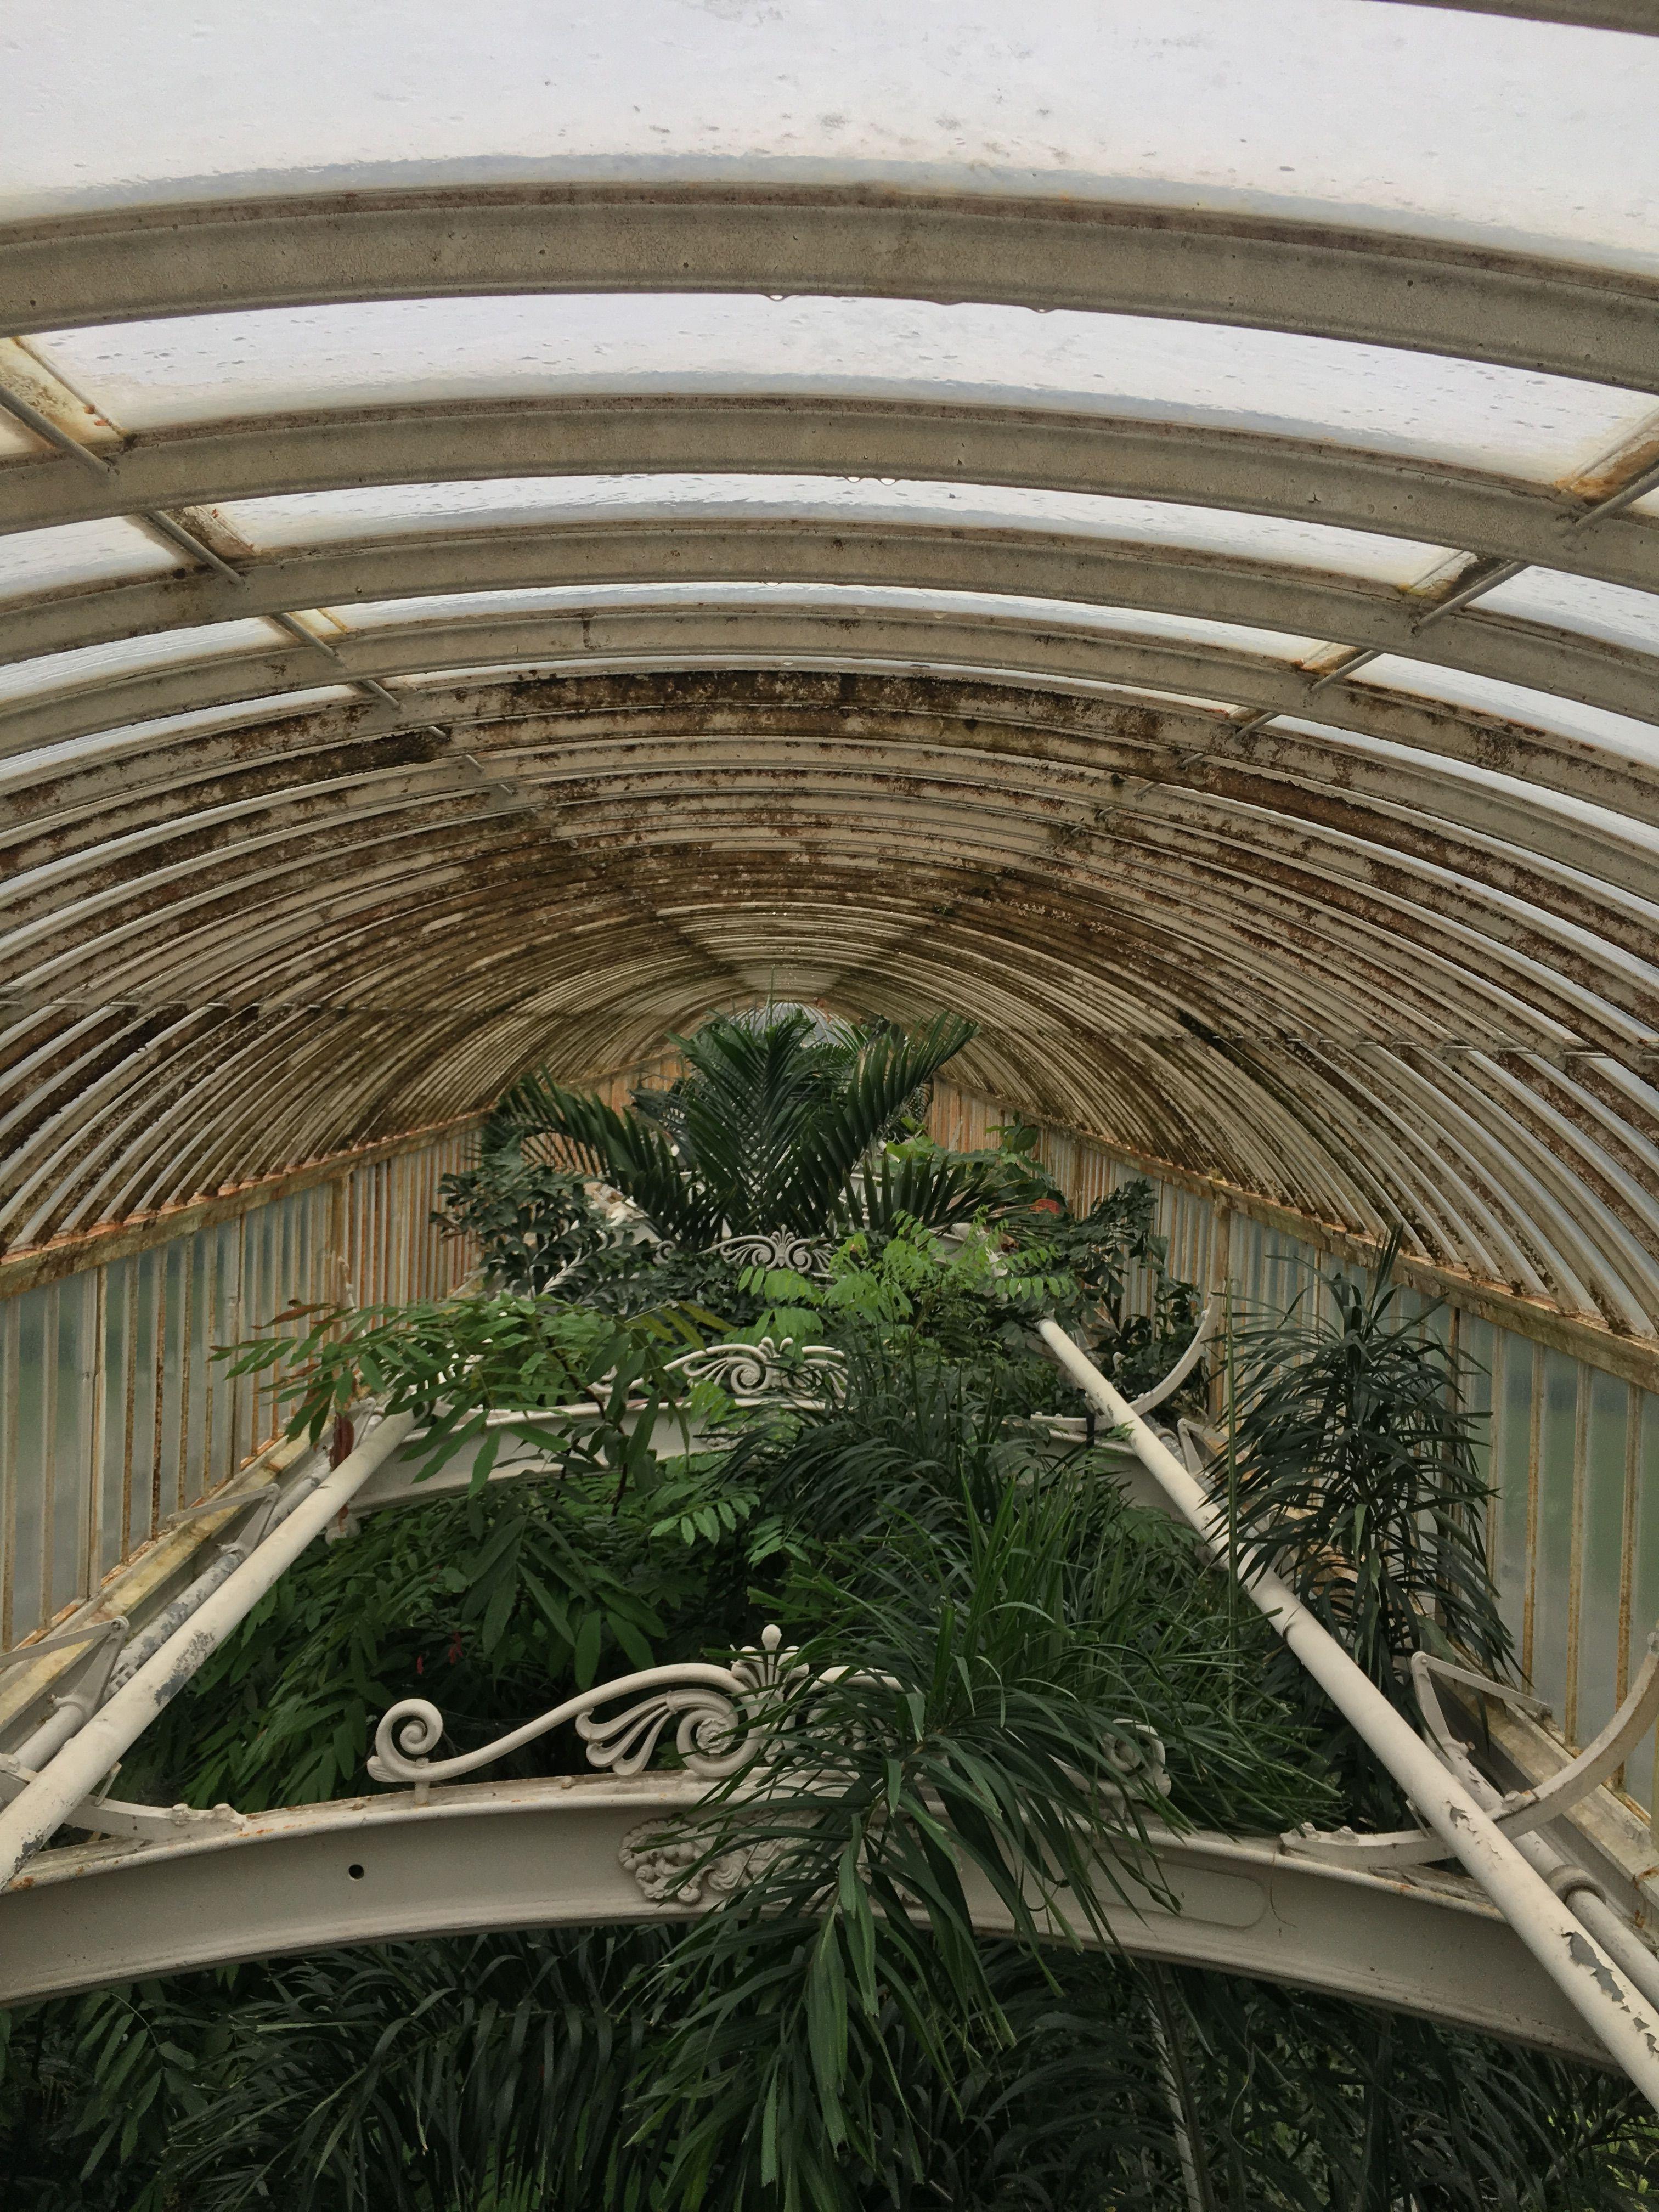 Pin by Isabel Thompson-Whiteside on KEW GARDENS | Pinterest | Kew ...